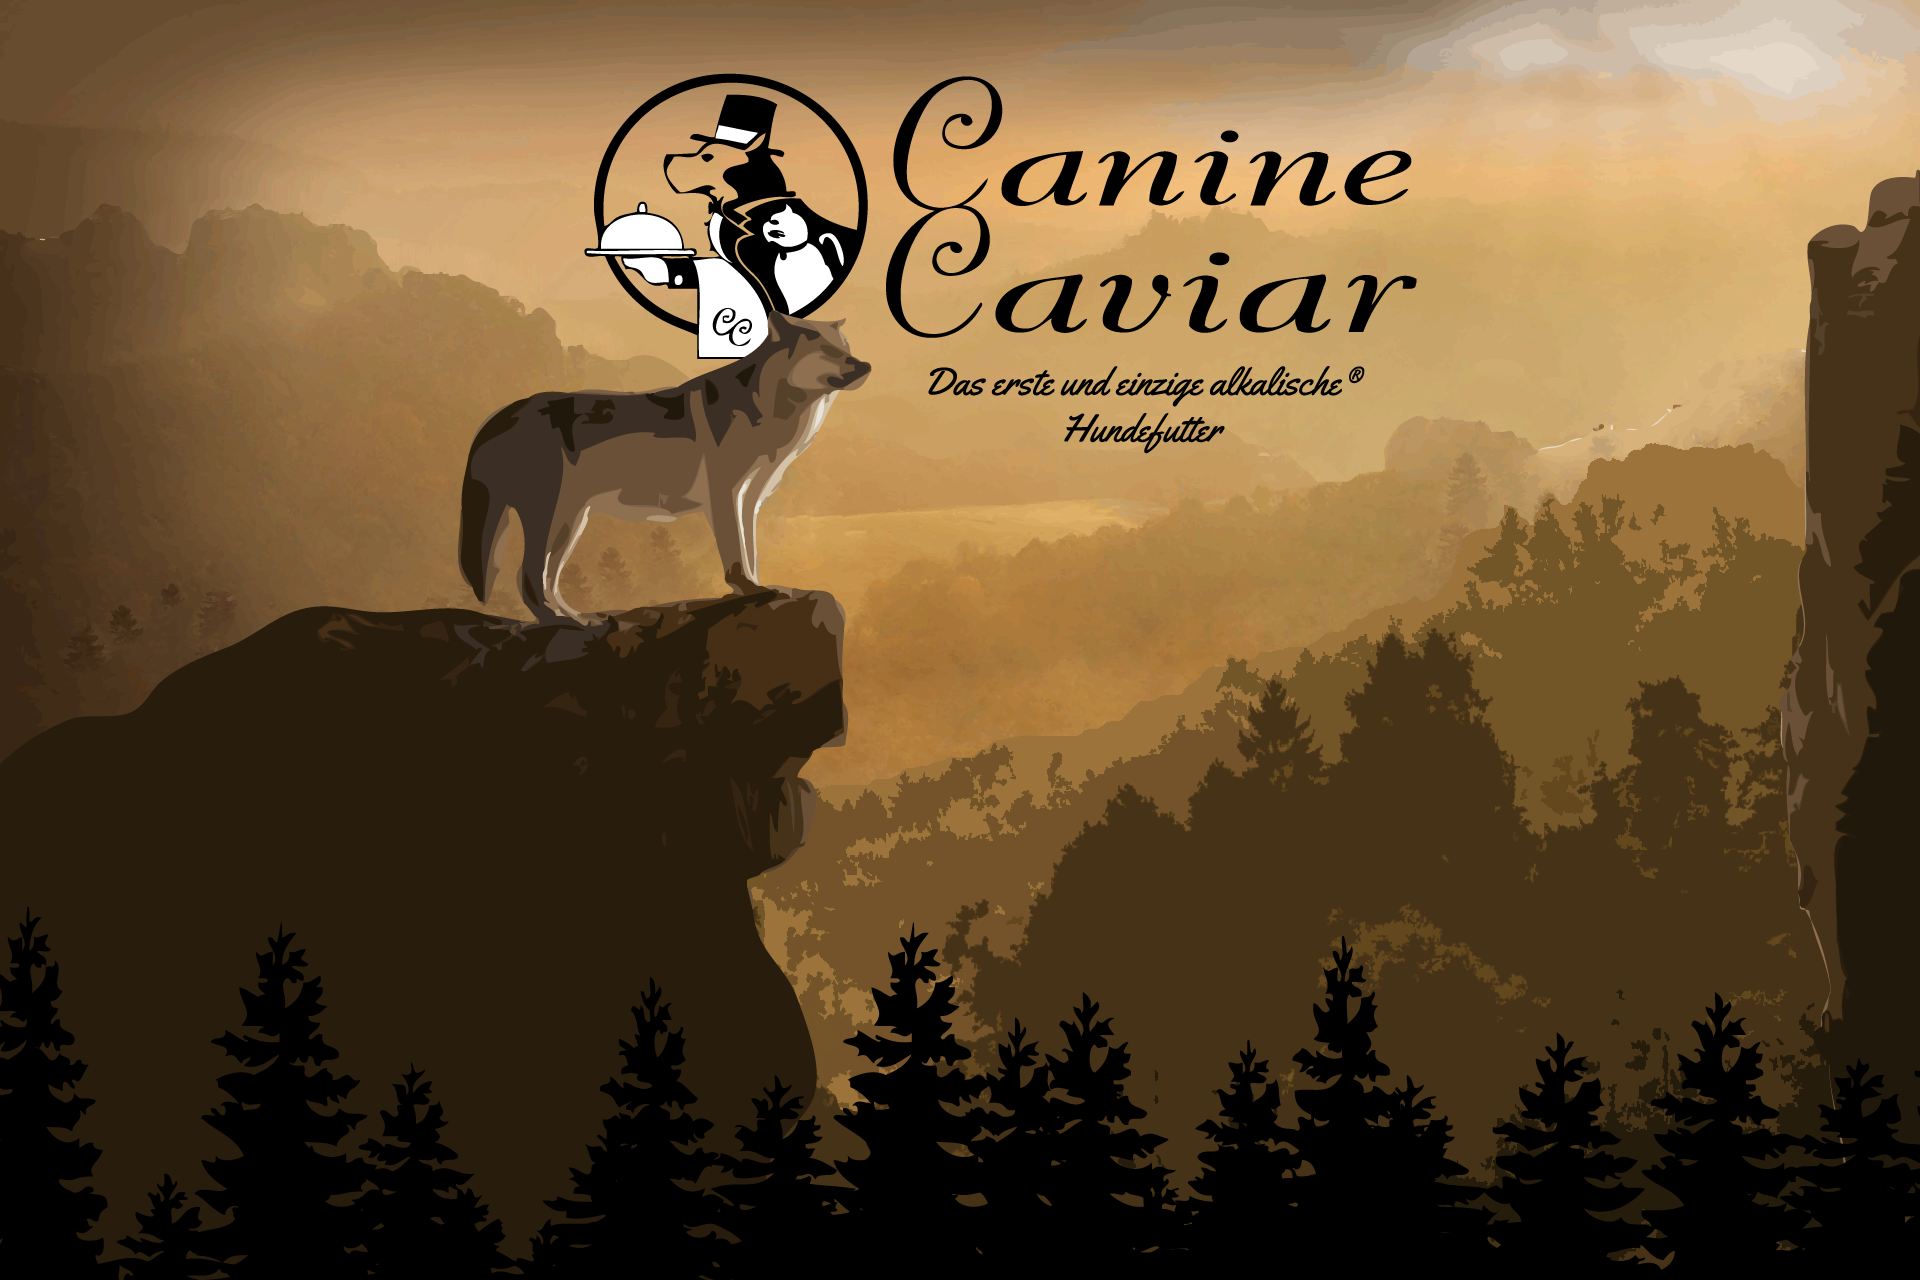 Canine Caviar Germany